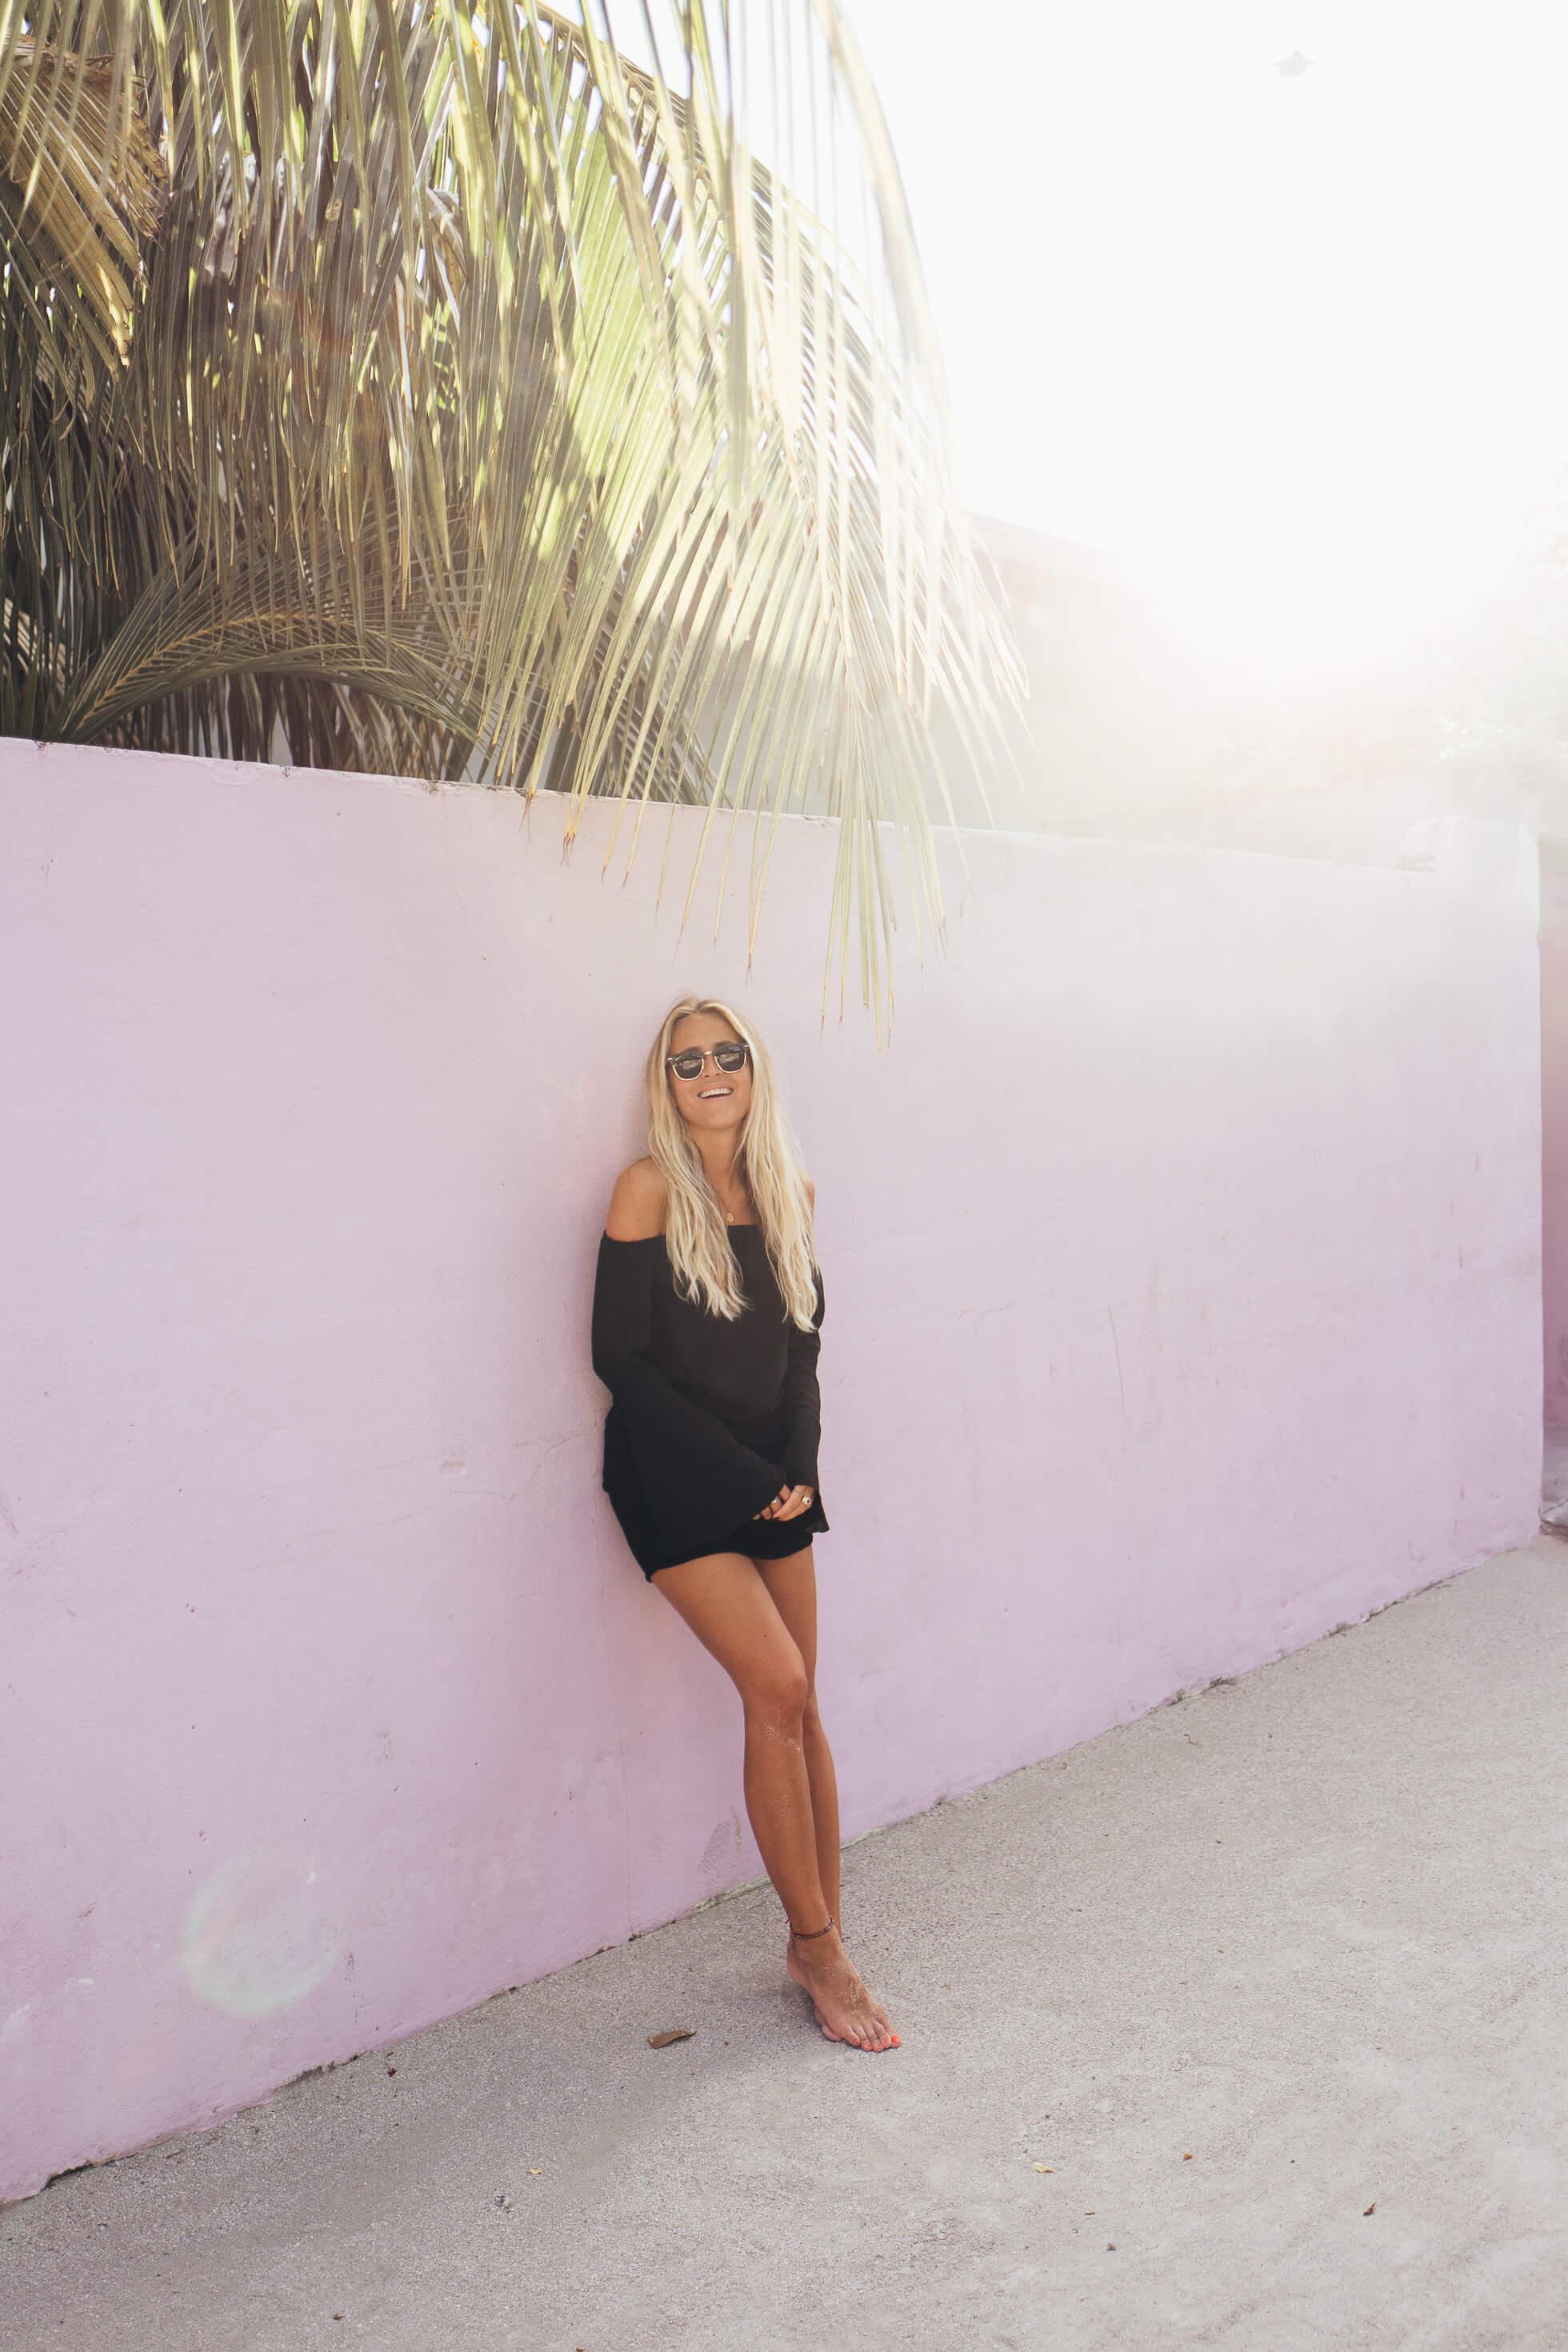 janni-deler-pink-walls-maldivesl1120276